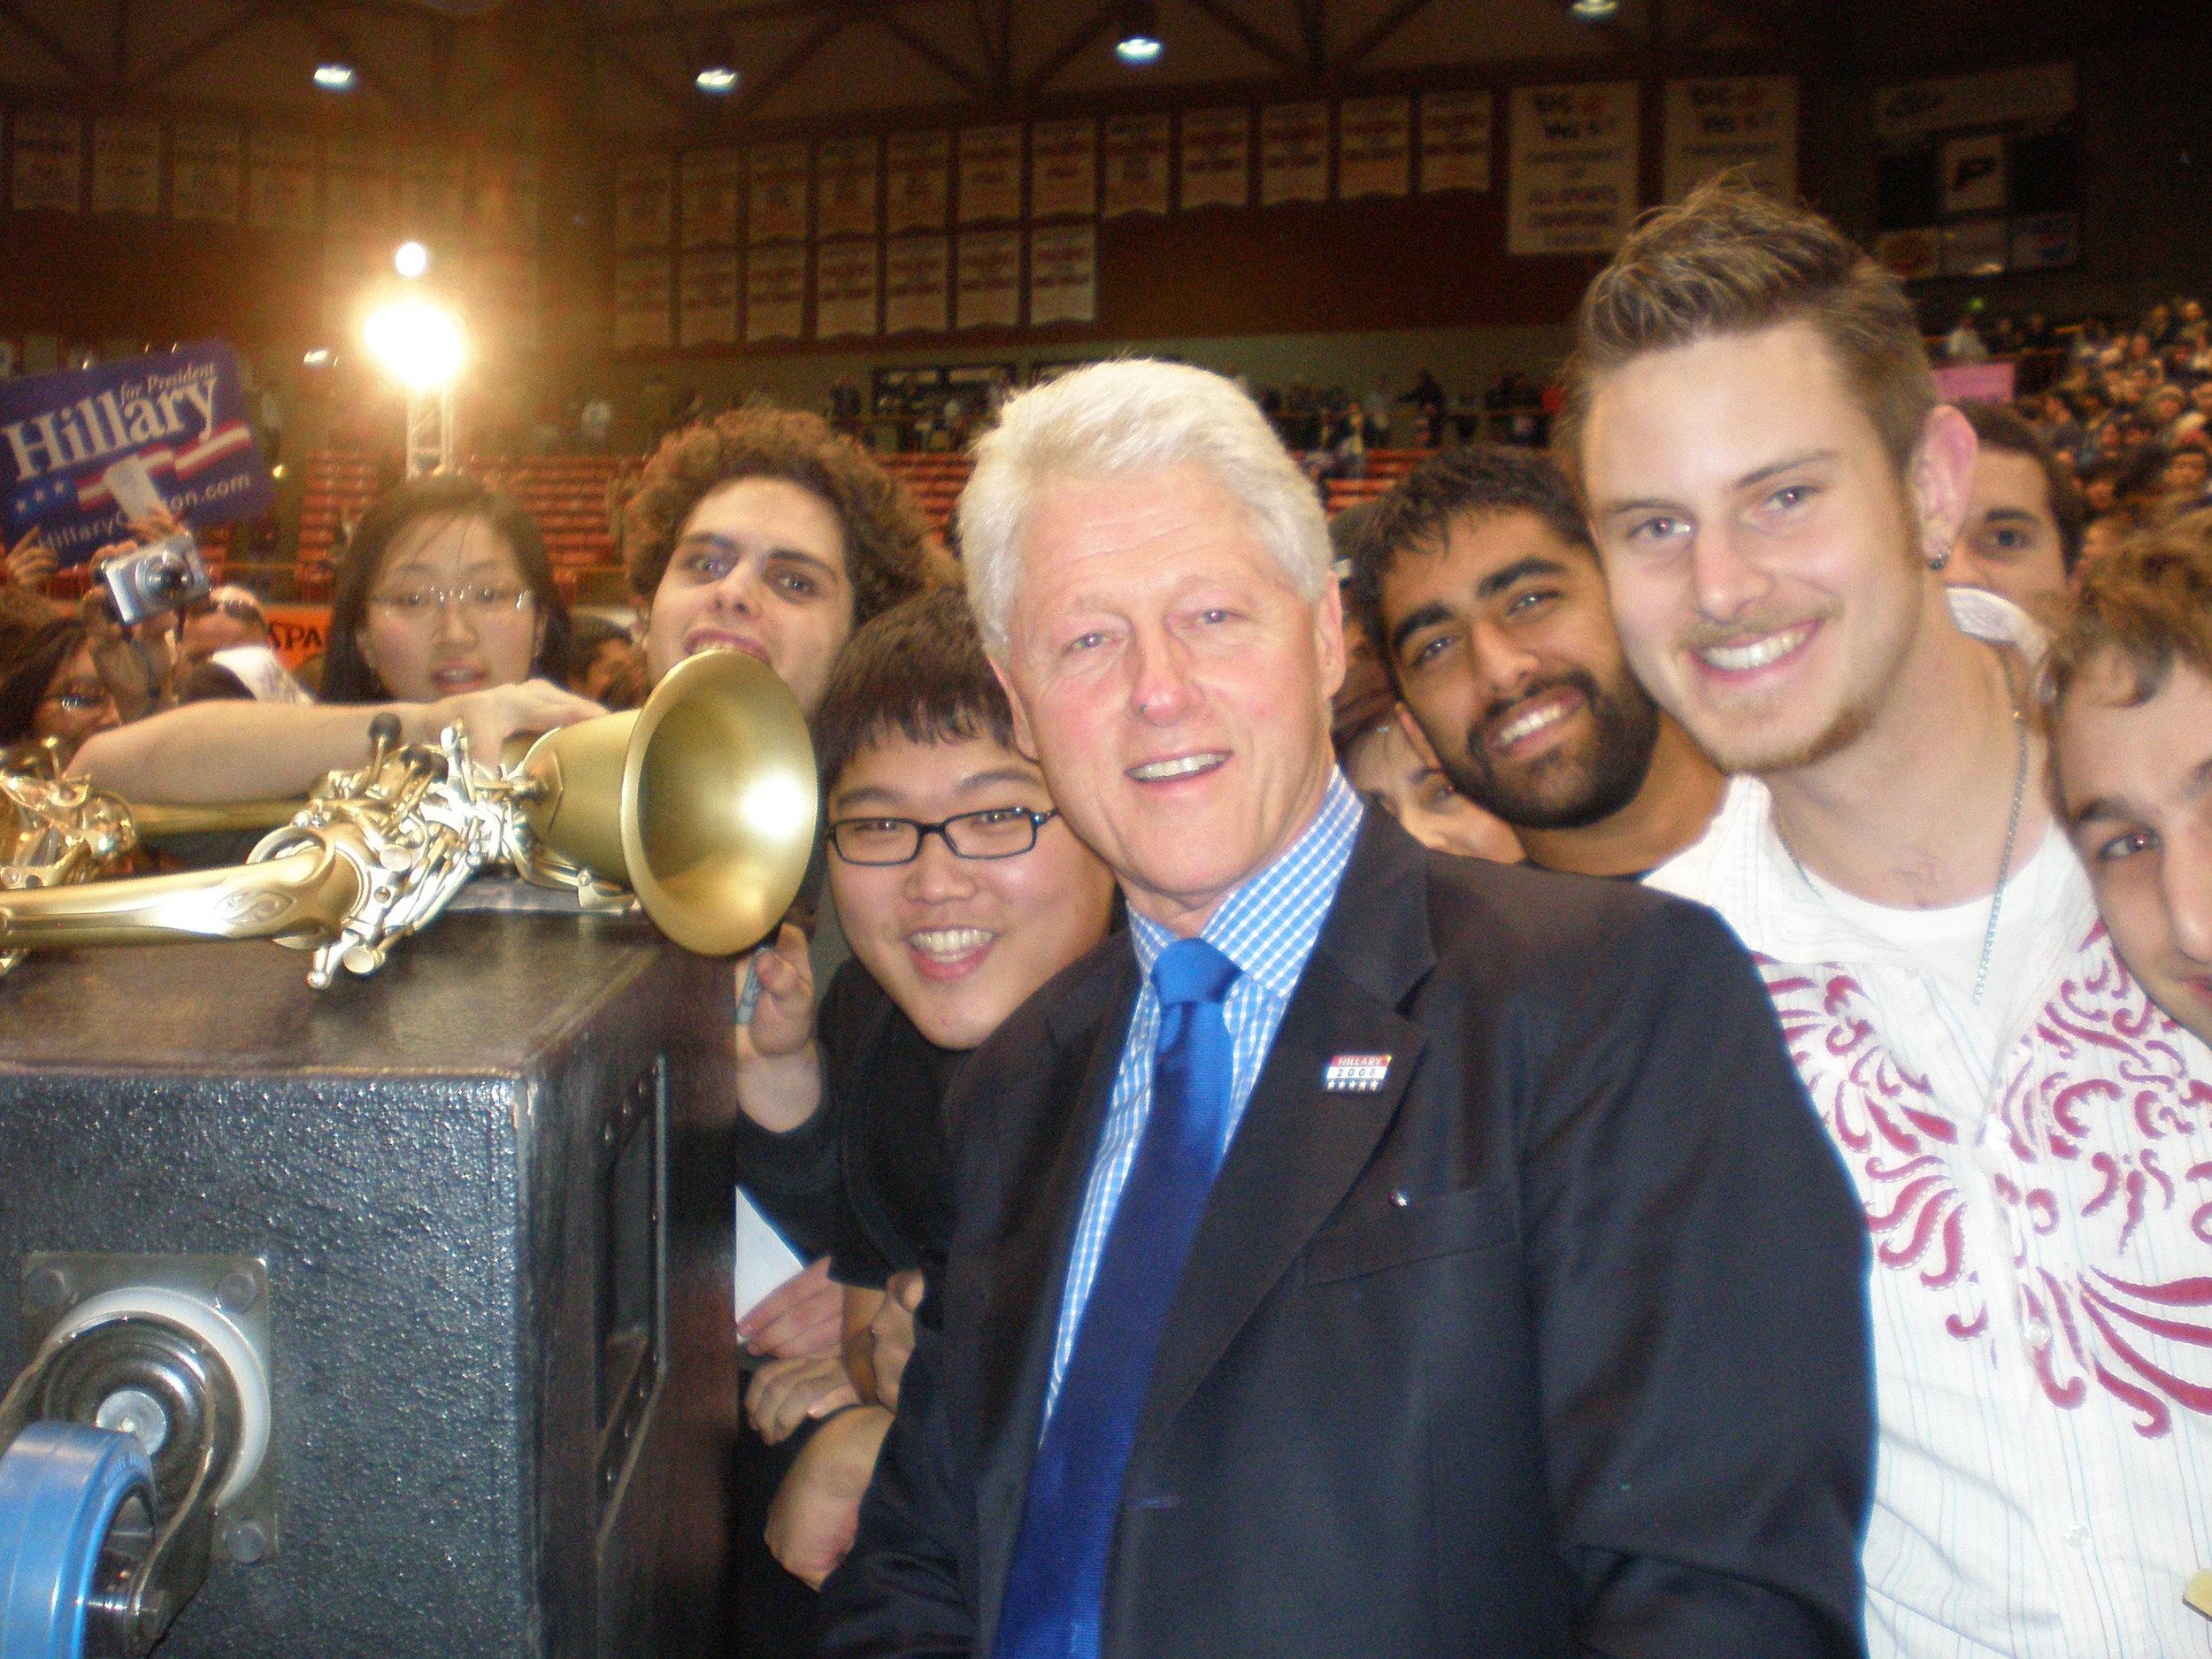 Ben and Bill Clinton